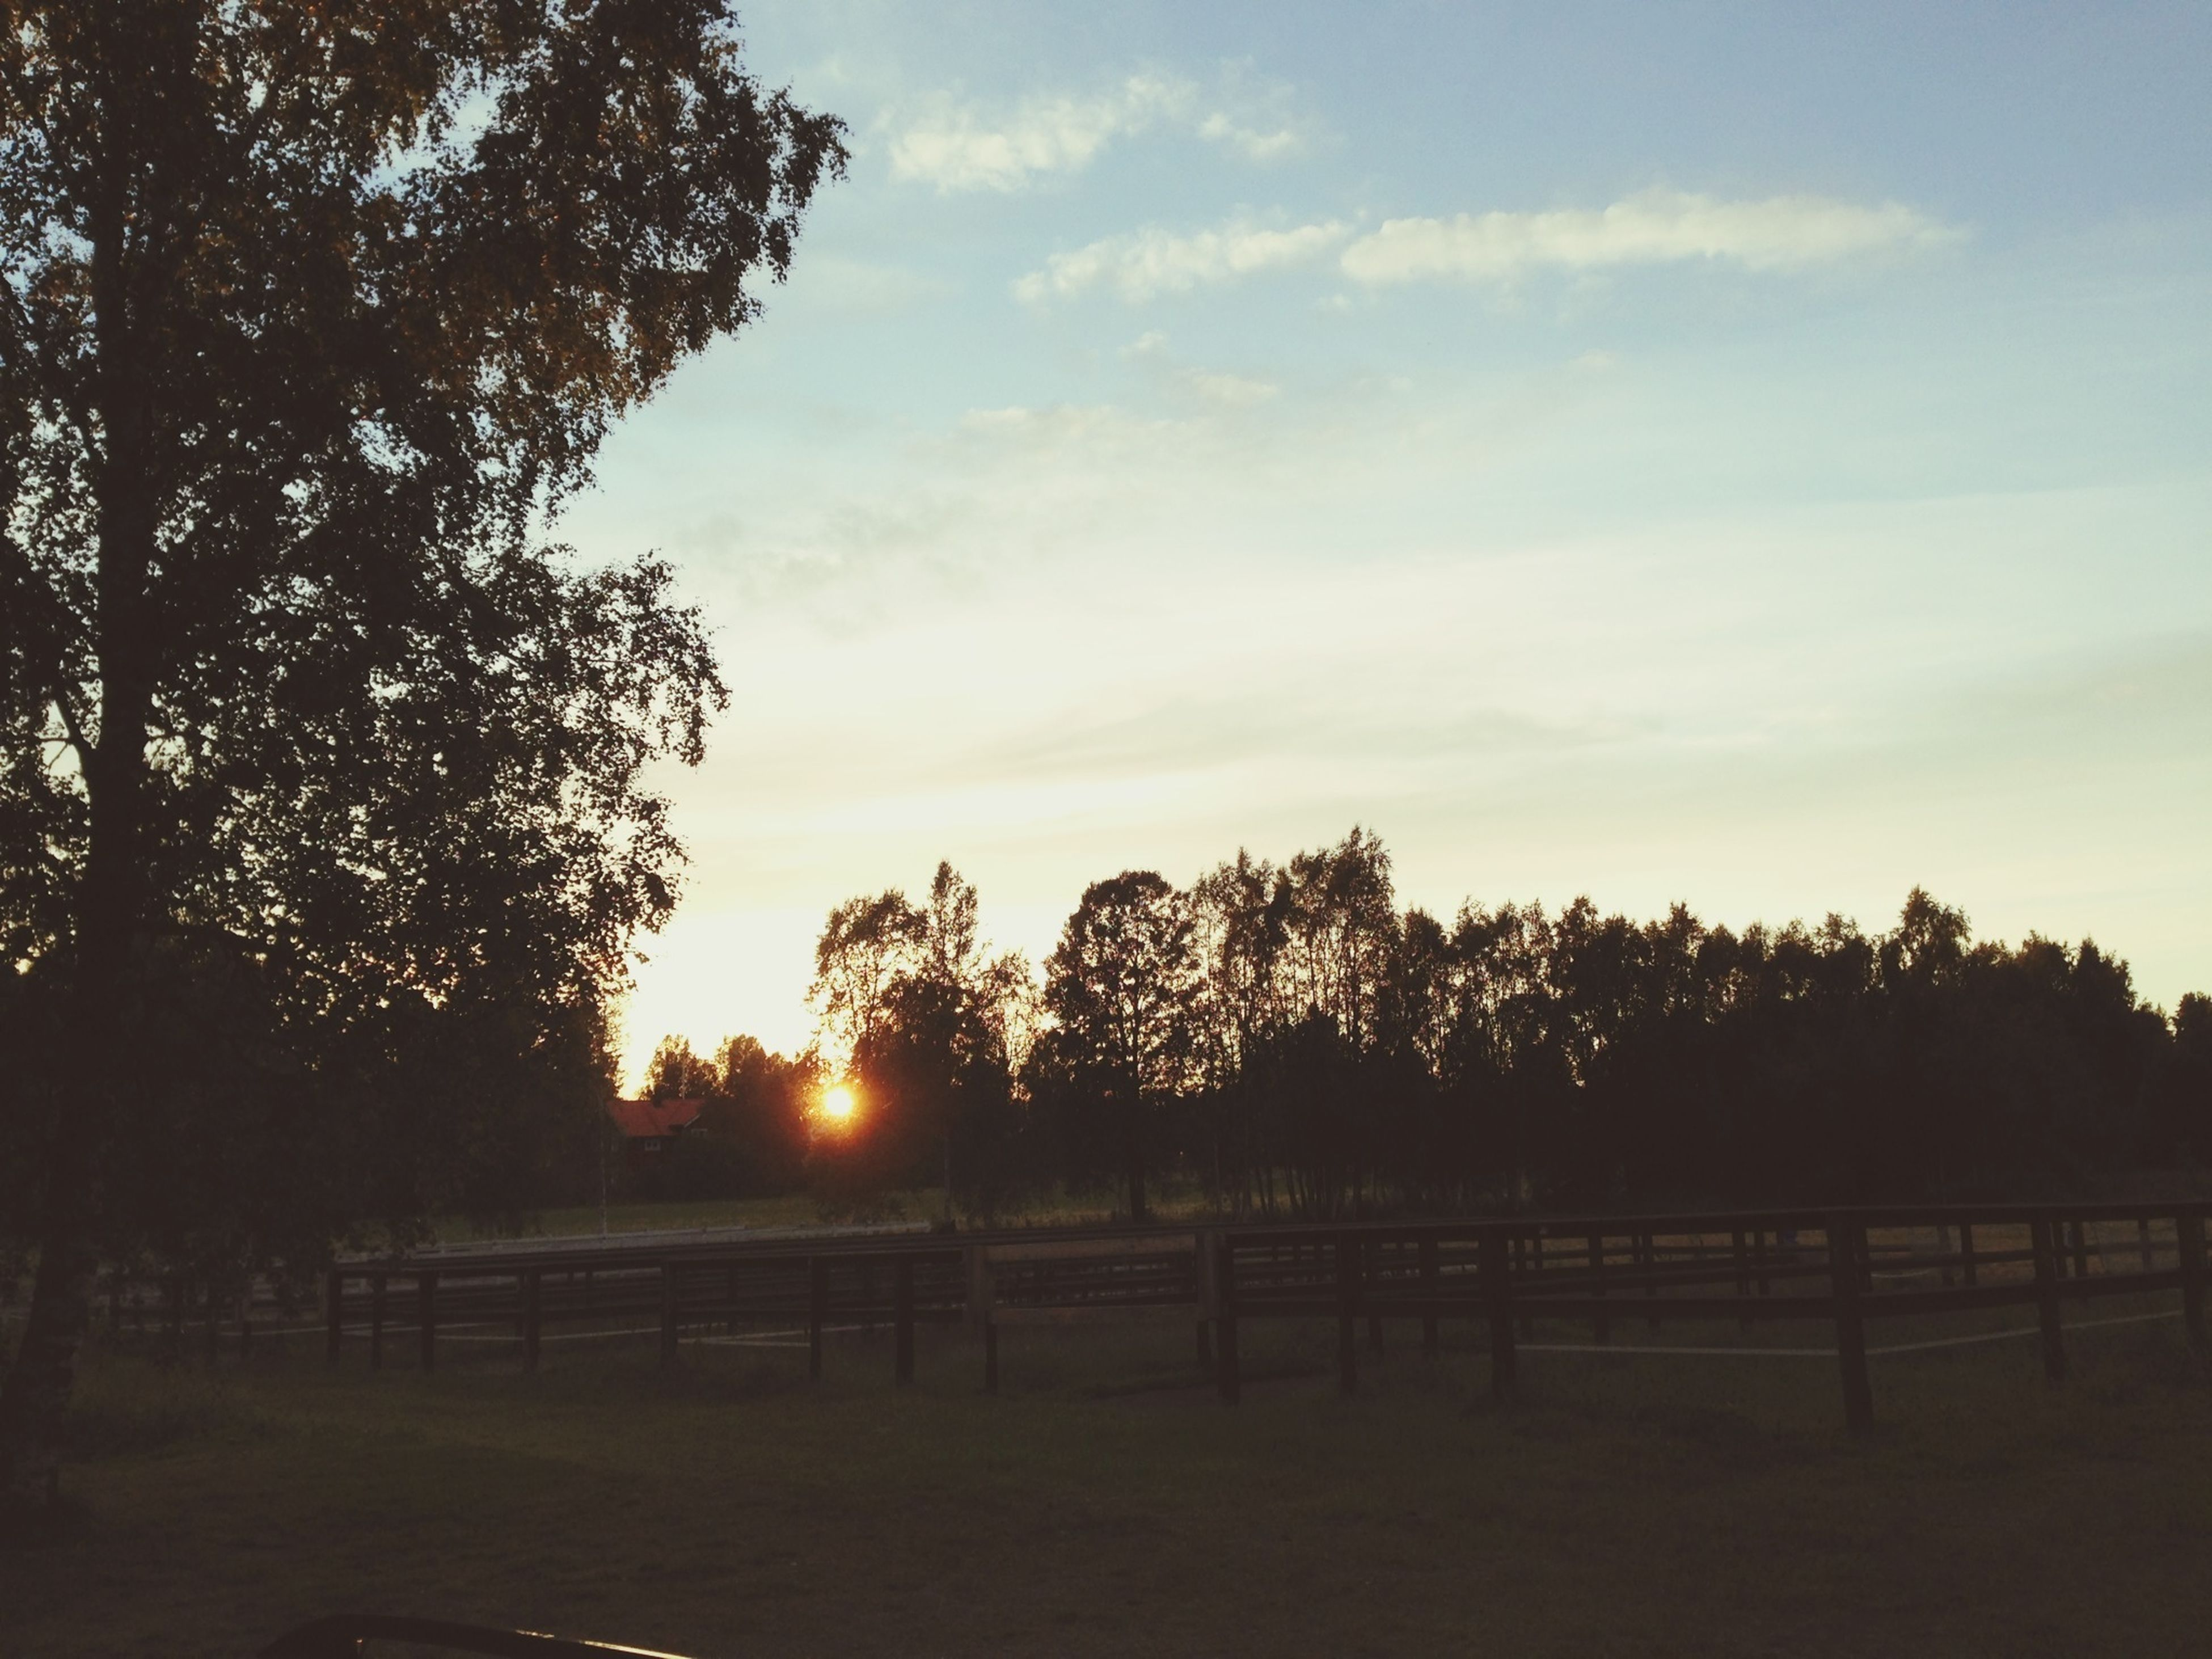 tree, tranquility, tranquil scene, sunset, landscape, sky, field, scenics, beauty in nature, nature, silhouette, sunlight, sun, growth, idyllic, cloud - sky, rural scene, fence, non-urban scene, grass